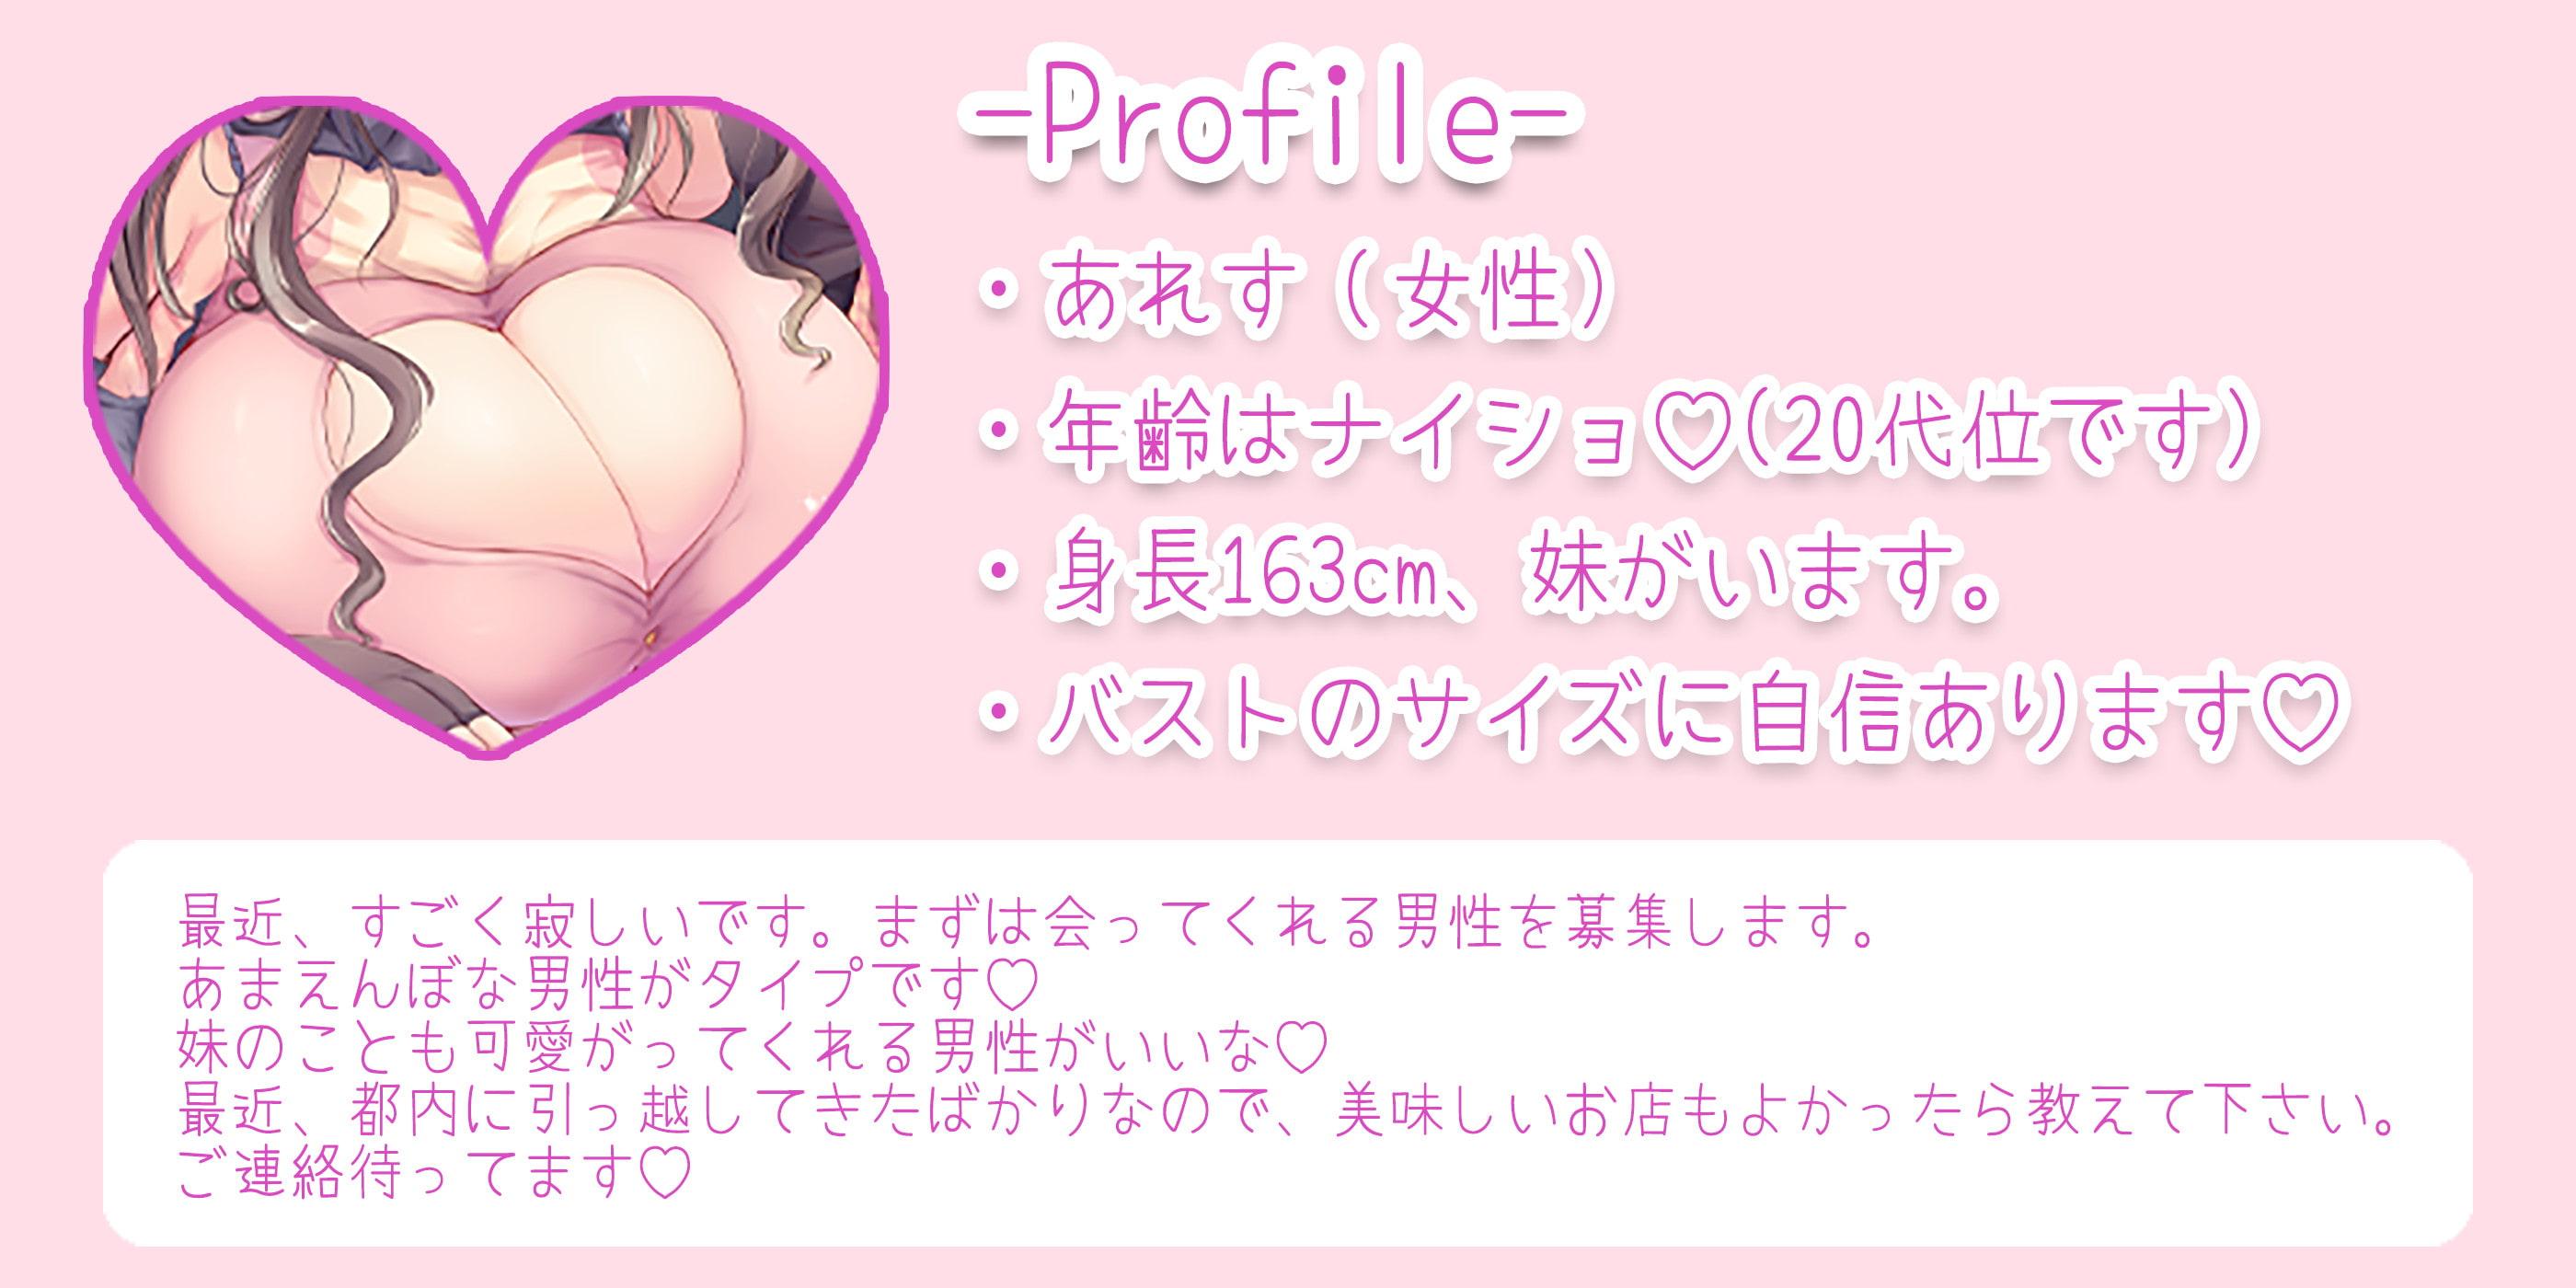 【KU100】サキュバス姉妹の耳奥舐めぐちゅぐちゅディナーショー [DreamLight]